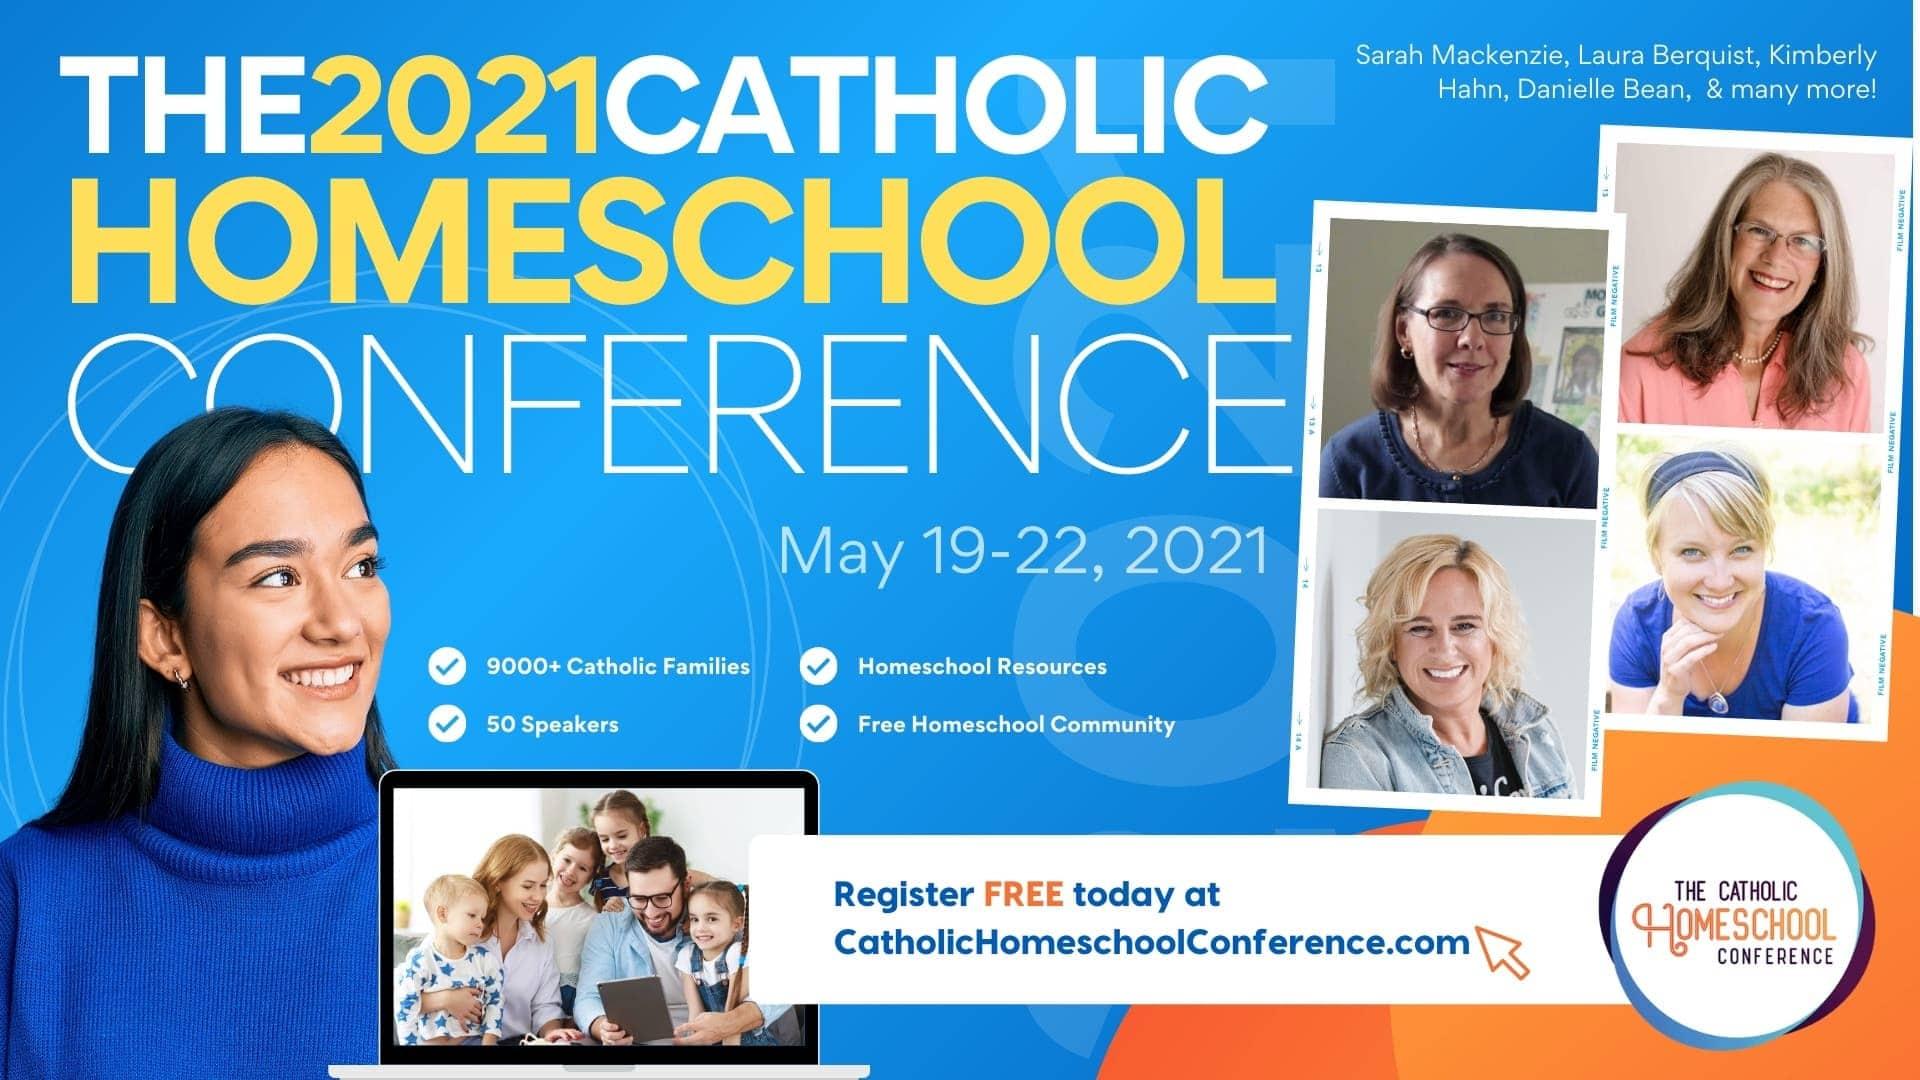 The 2021 Catholic Homeschool Conference